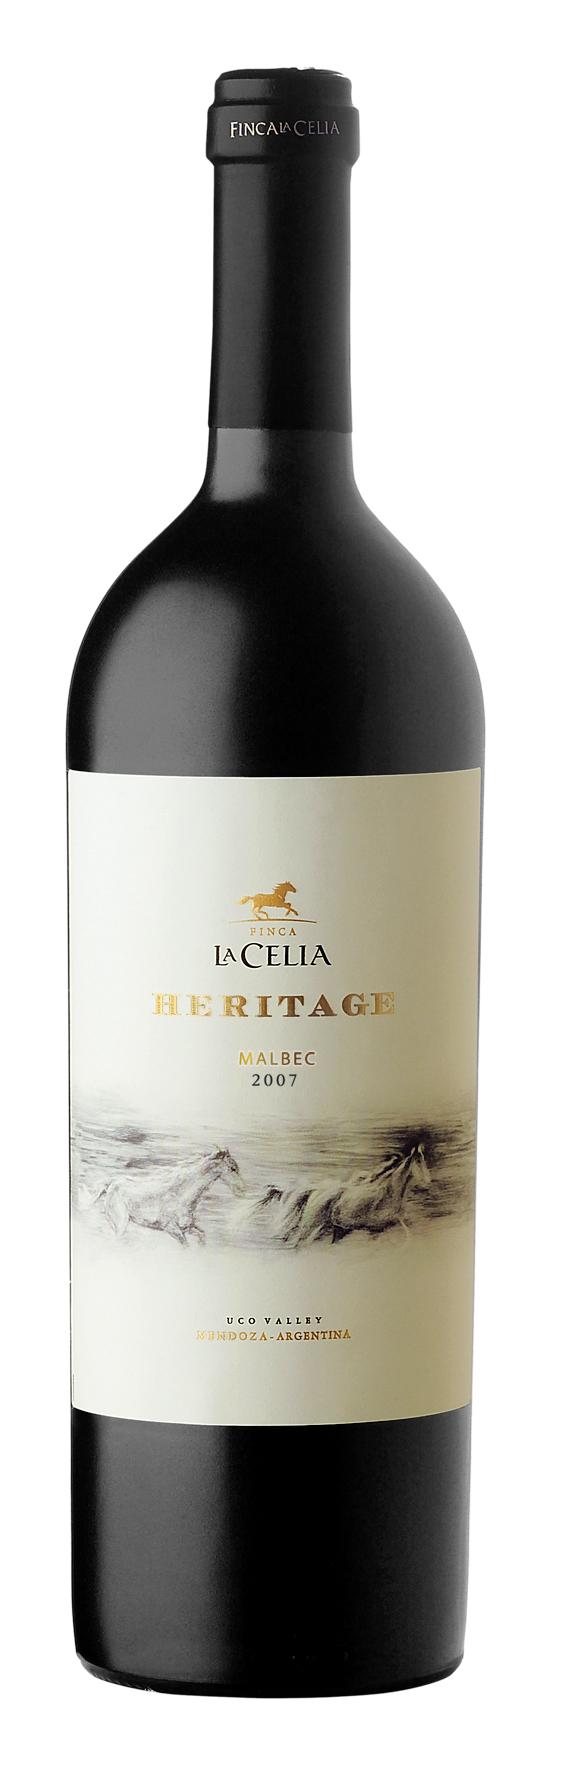 heritage malbec finca la celia malbec world day wine label mxm wine label pinterest. Black Bedroom Furniture Sets. Home Design Ideas